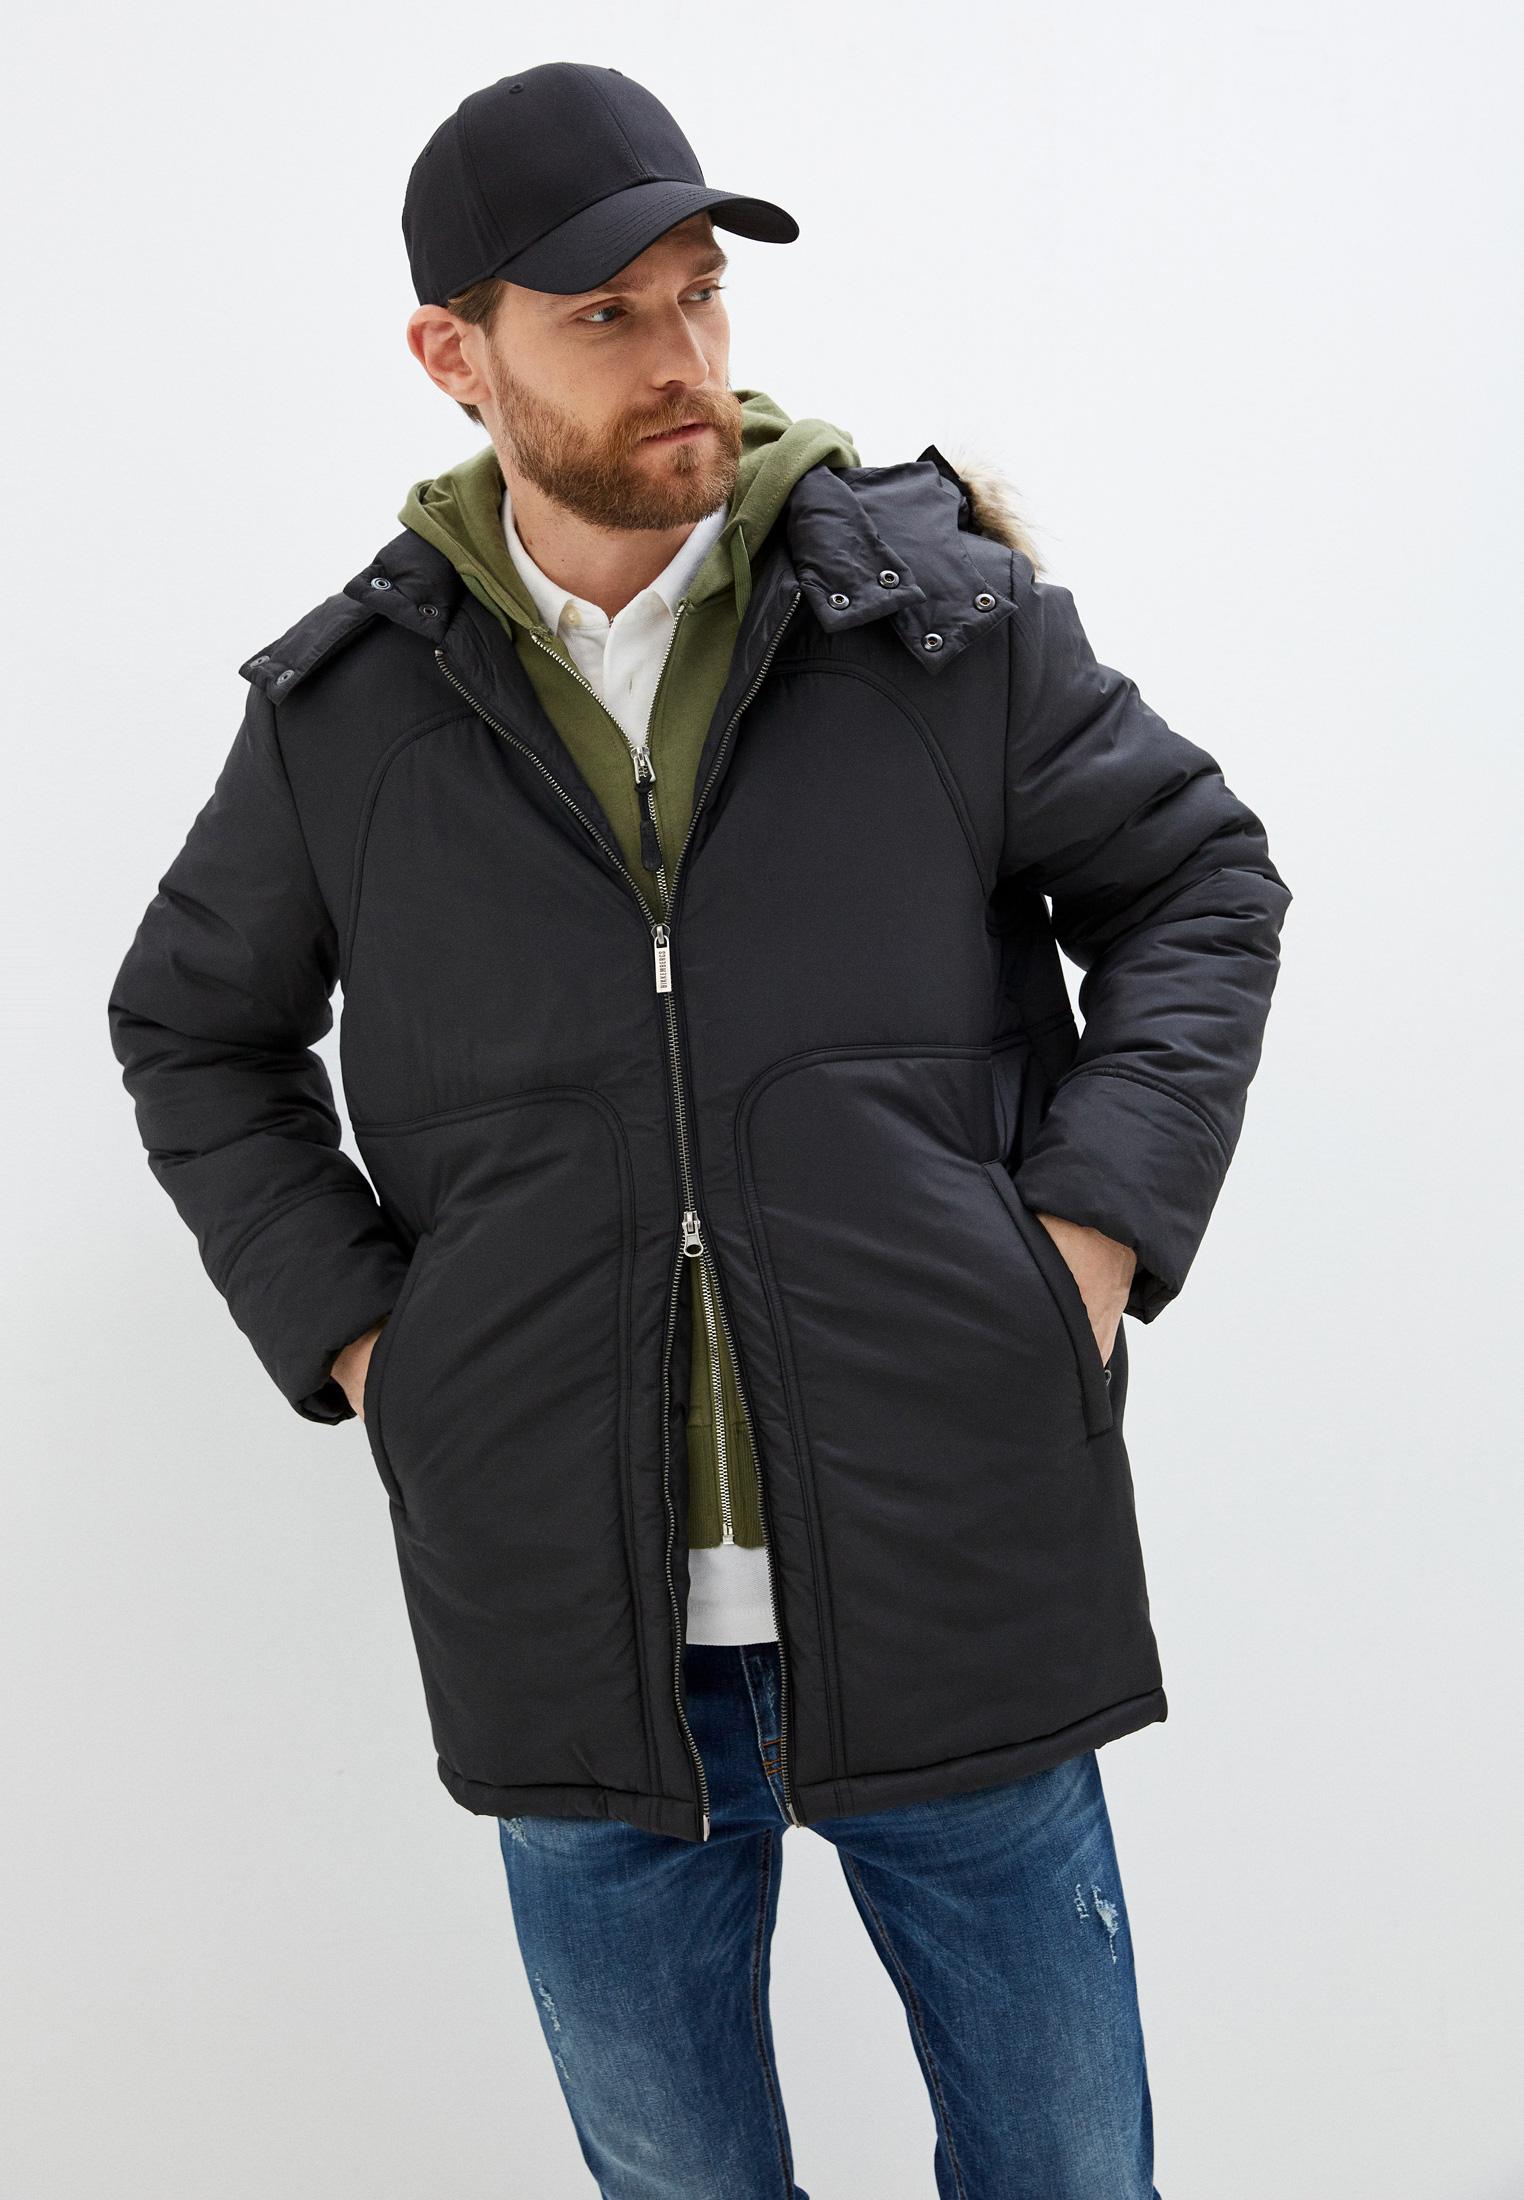 Мужская куртка Bikkembergs (Биккембергс) C J 024 00 T 9591